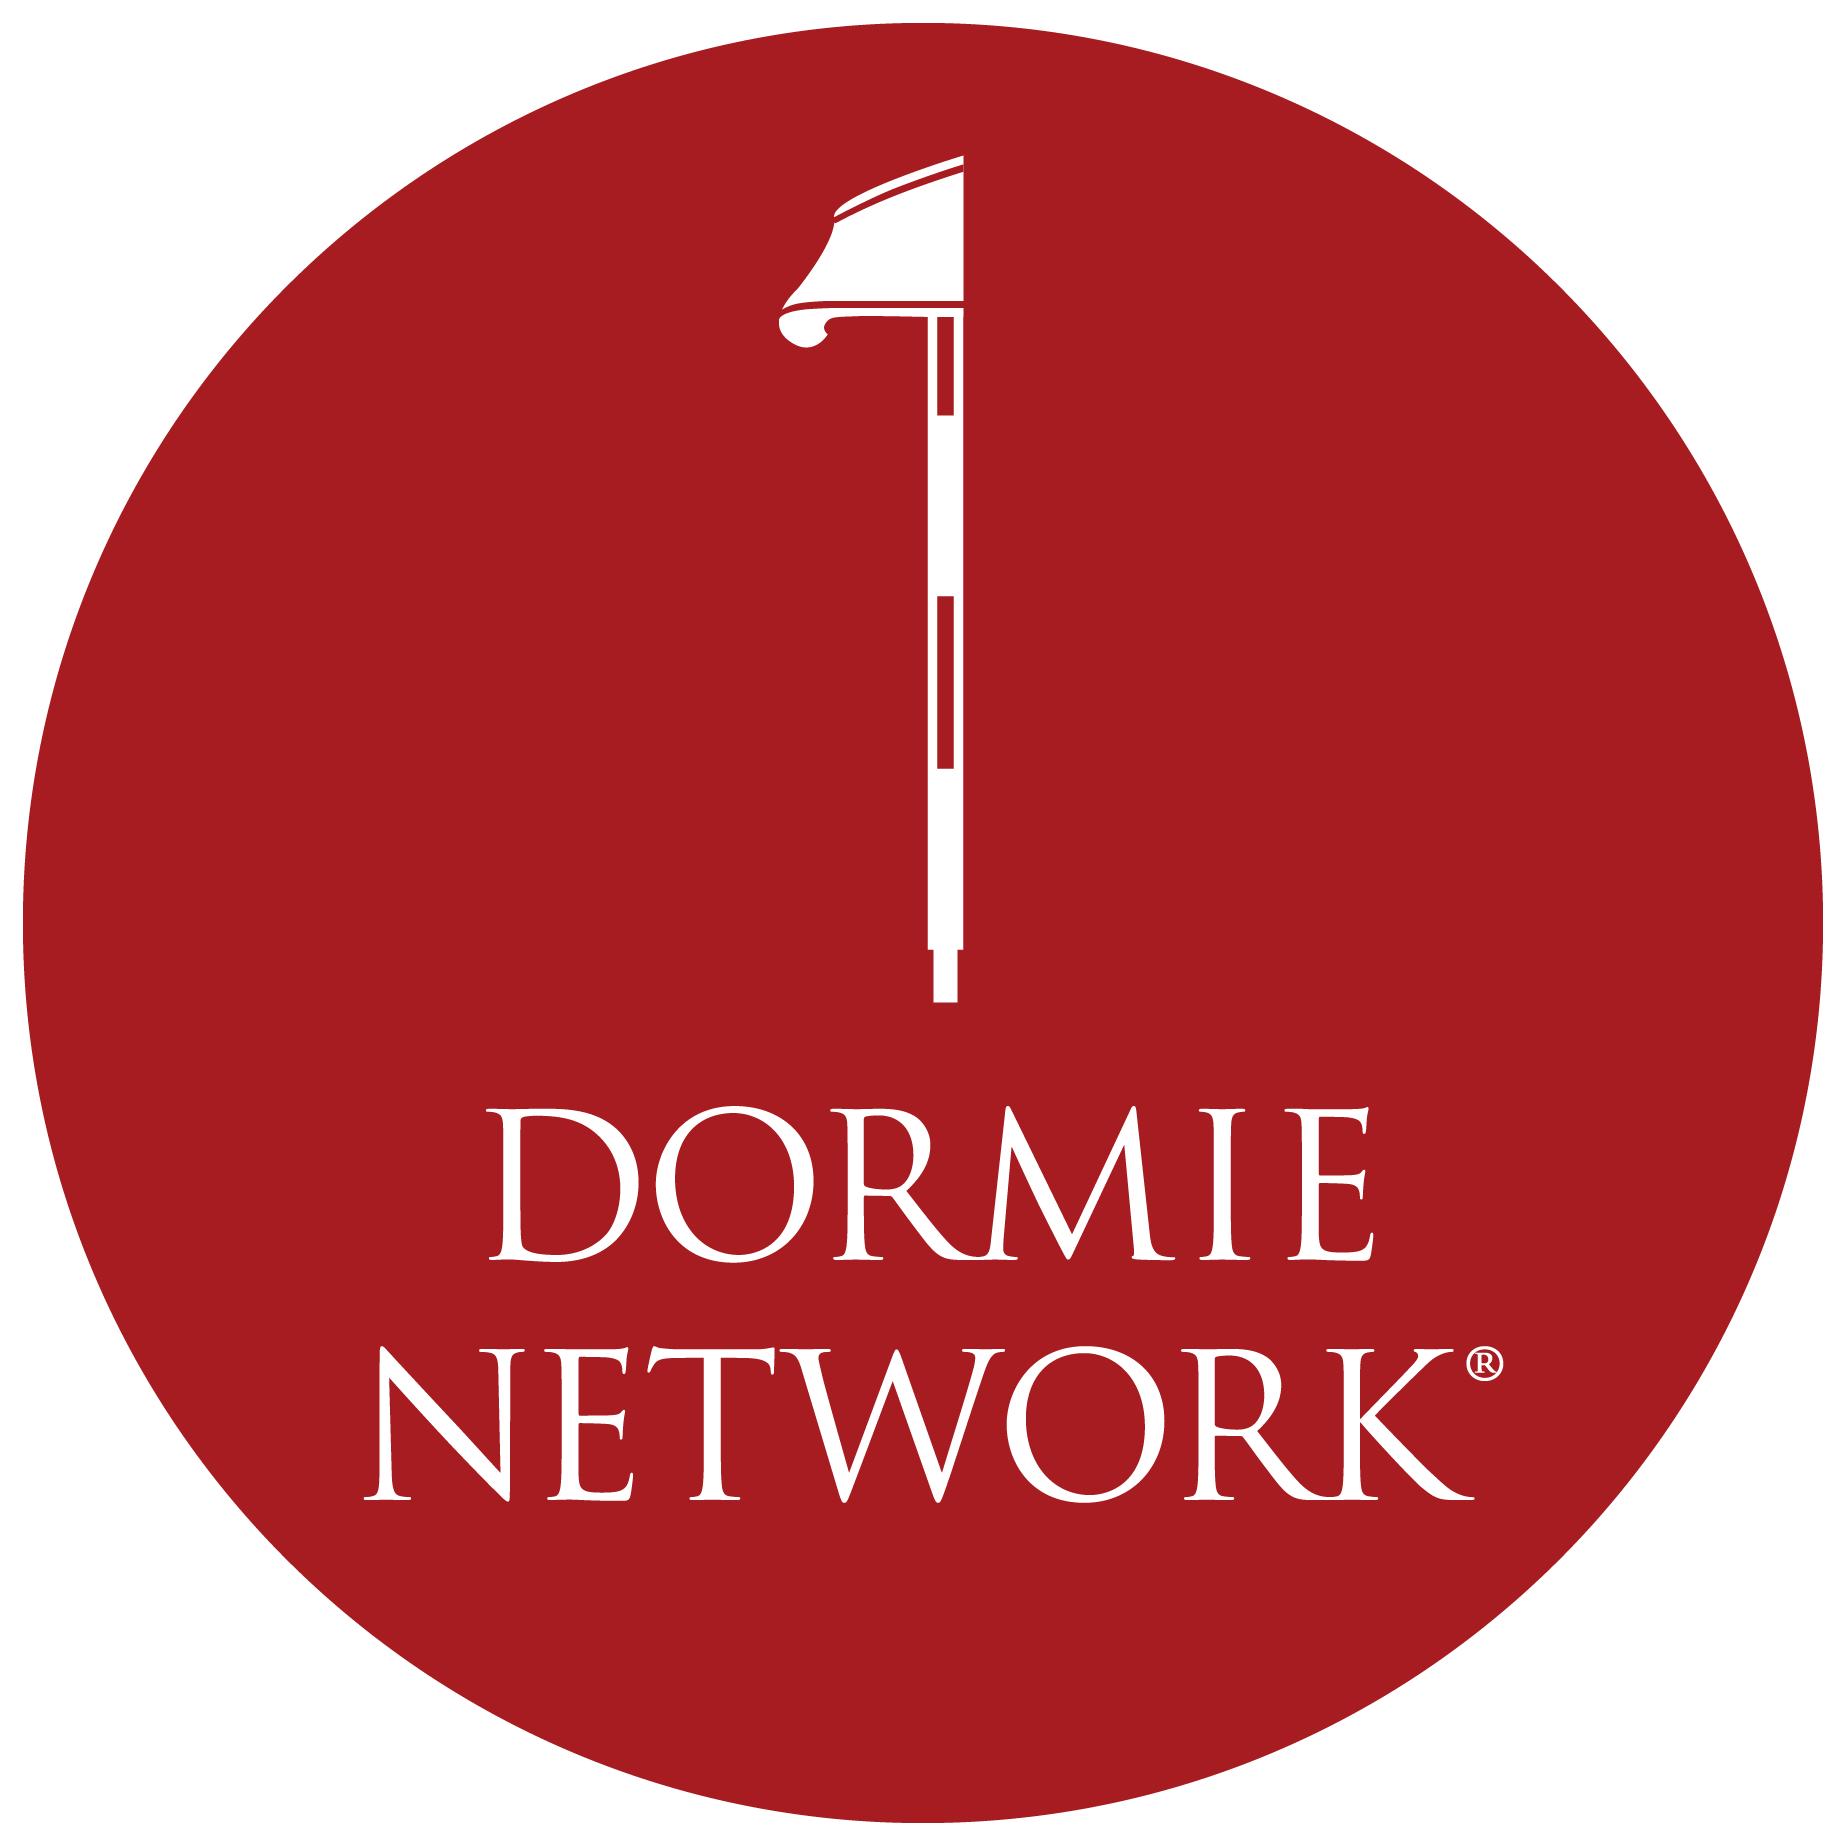 Dormie network logo